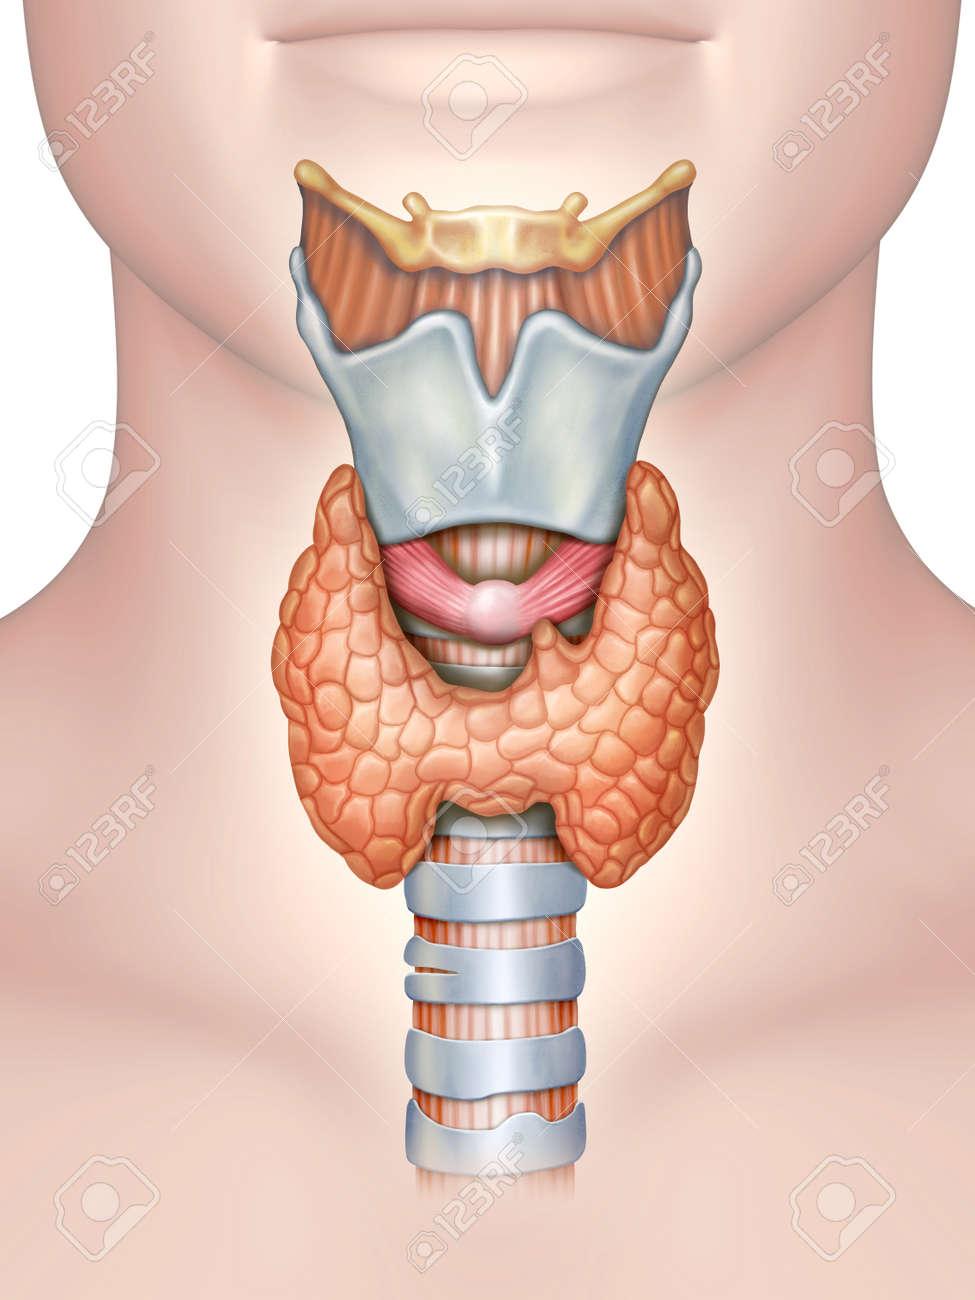 Anatomy Of The Thyroid Gland. Digital Illustration. Stock Photo ...